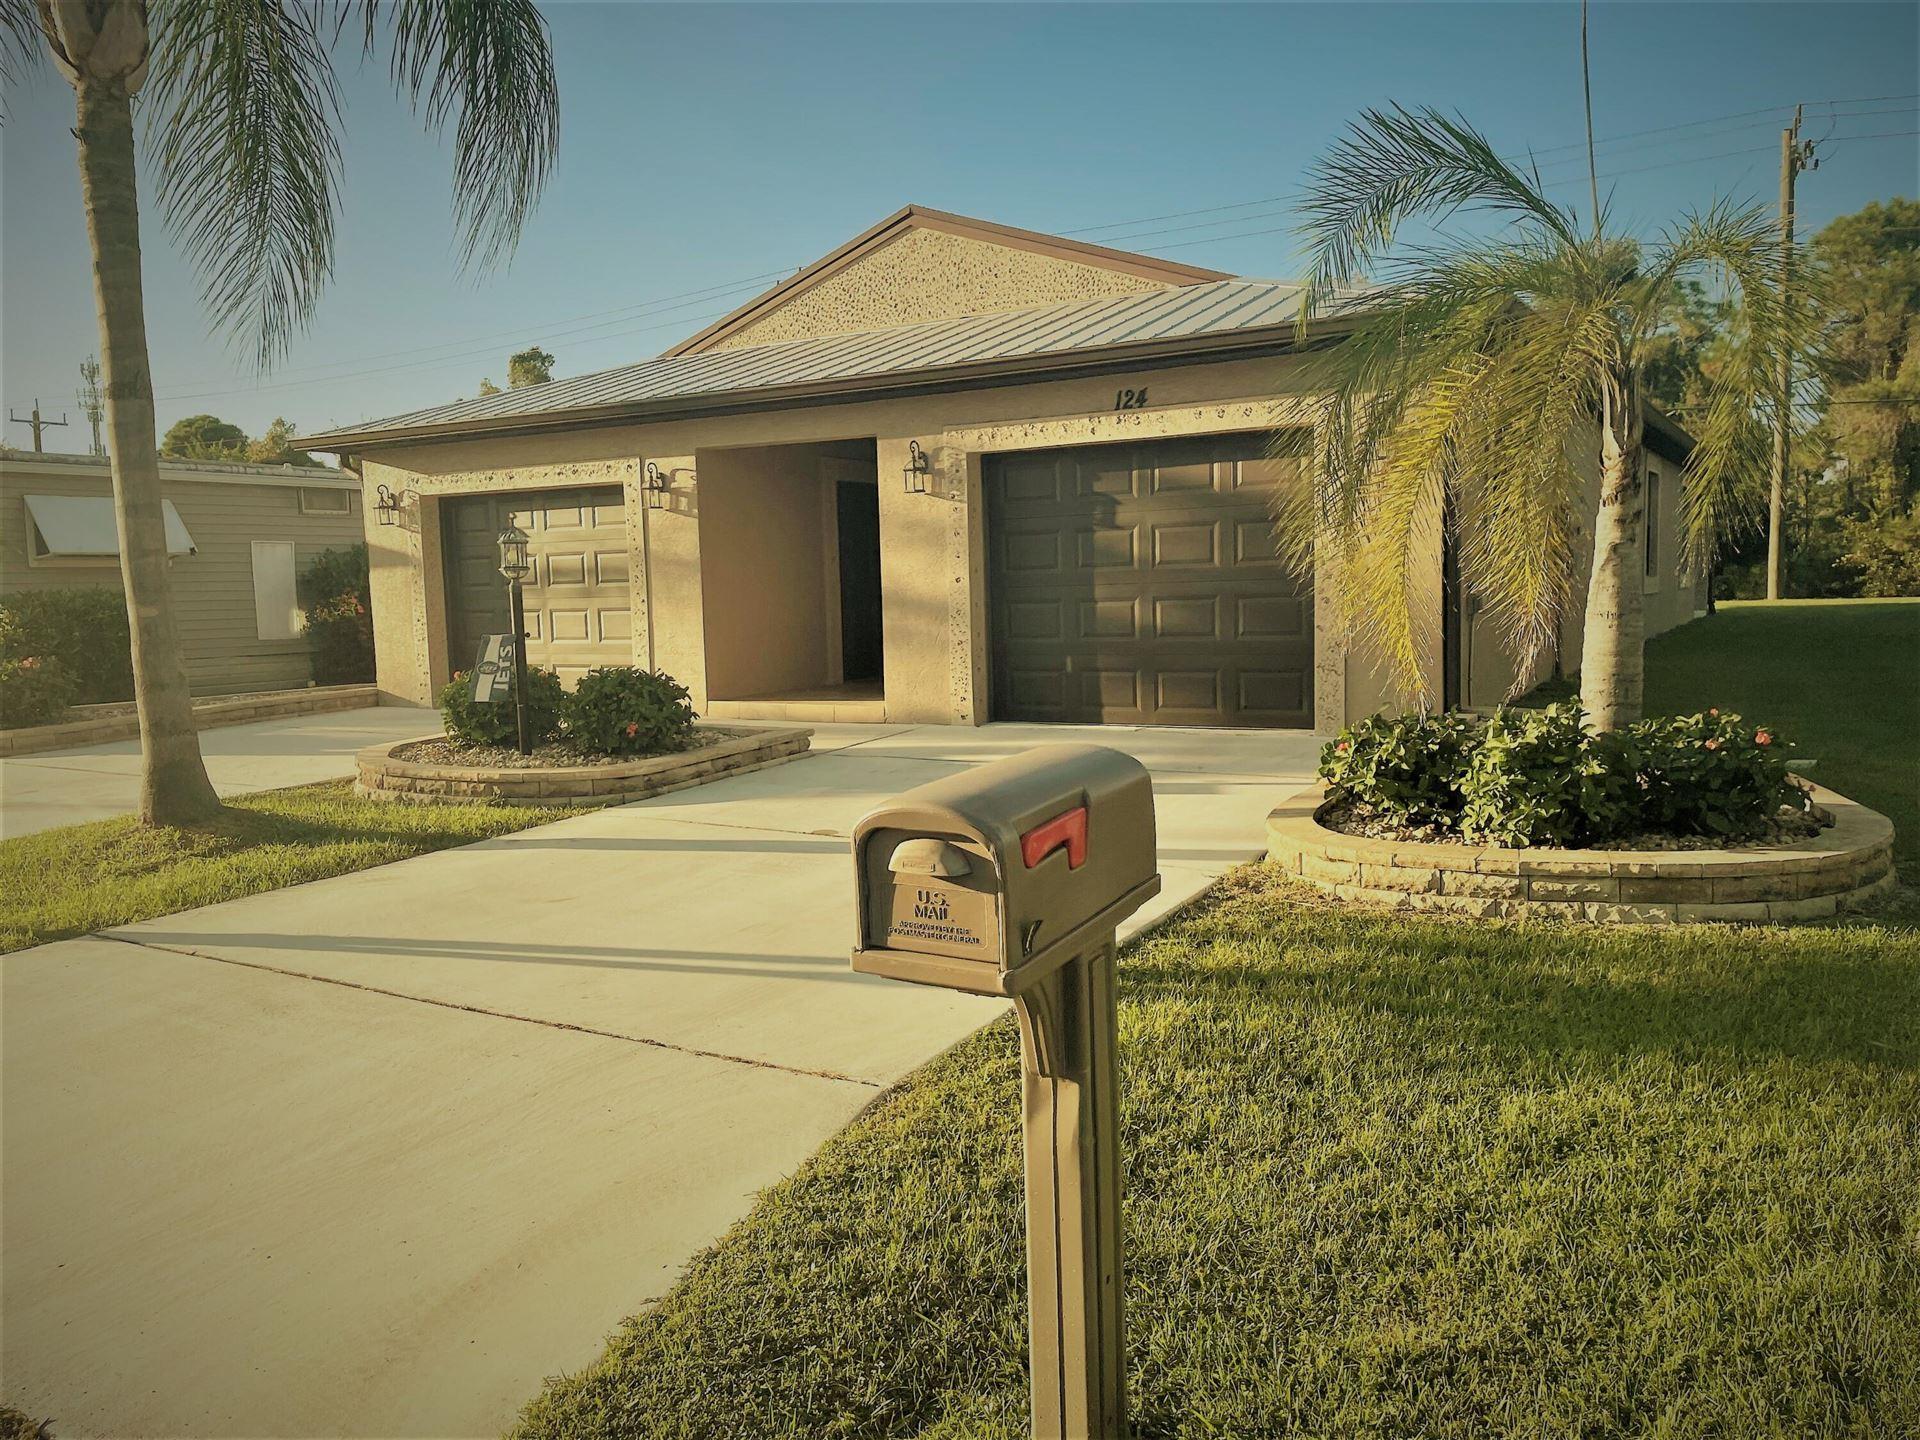 124 Mediterranean Boulevard N, Port Saint Lucie, FL 34952 - MLS#: RX-10751737